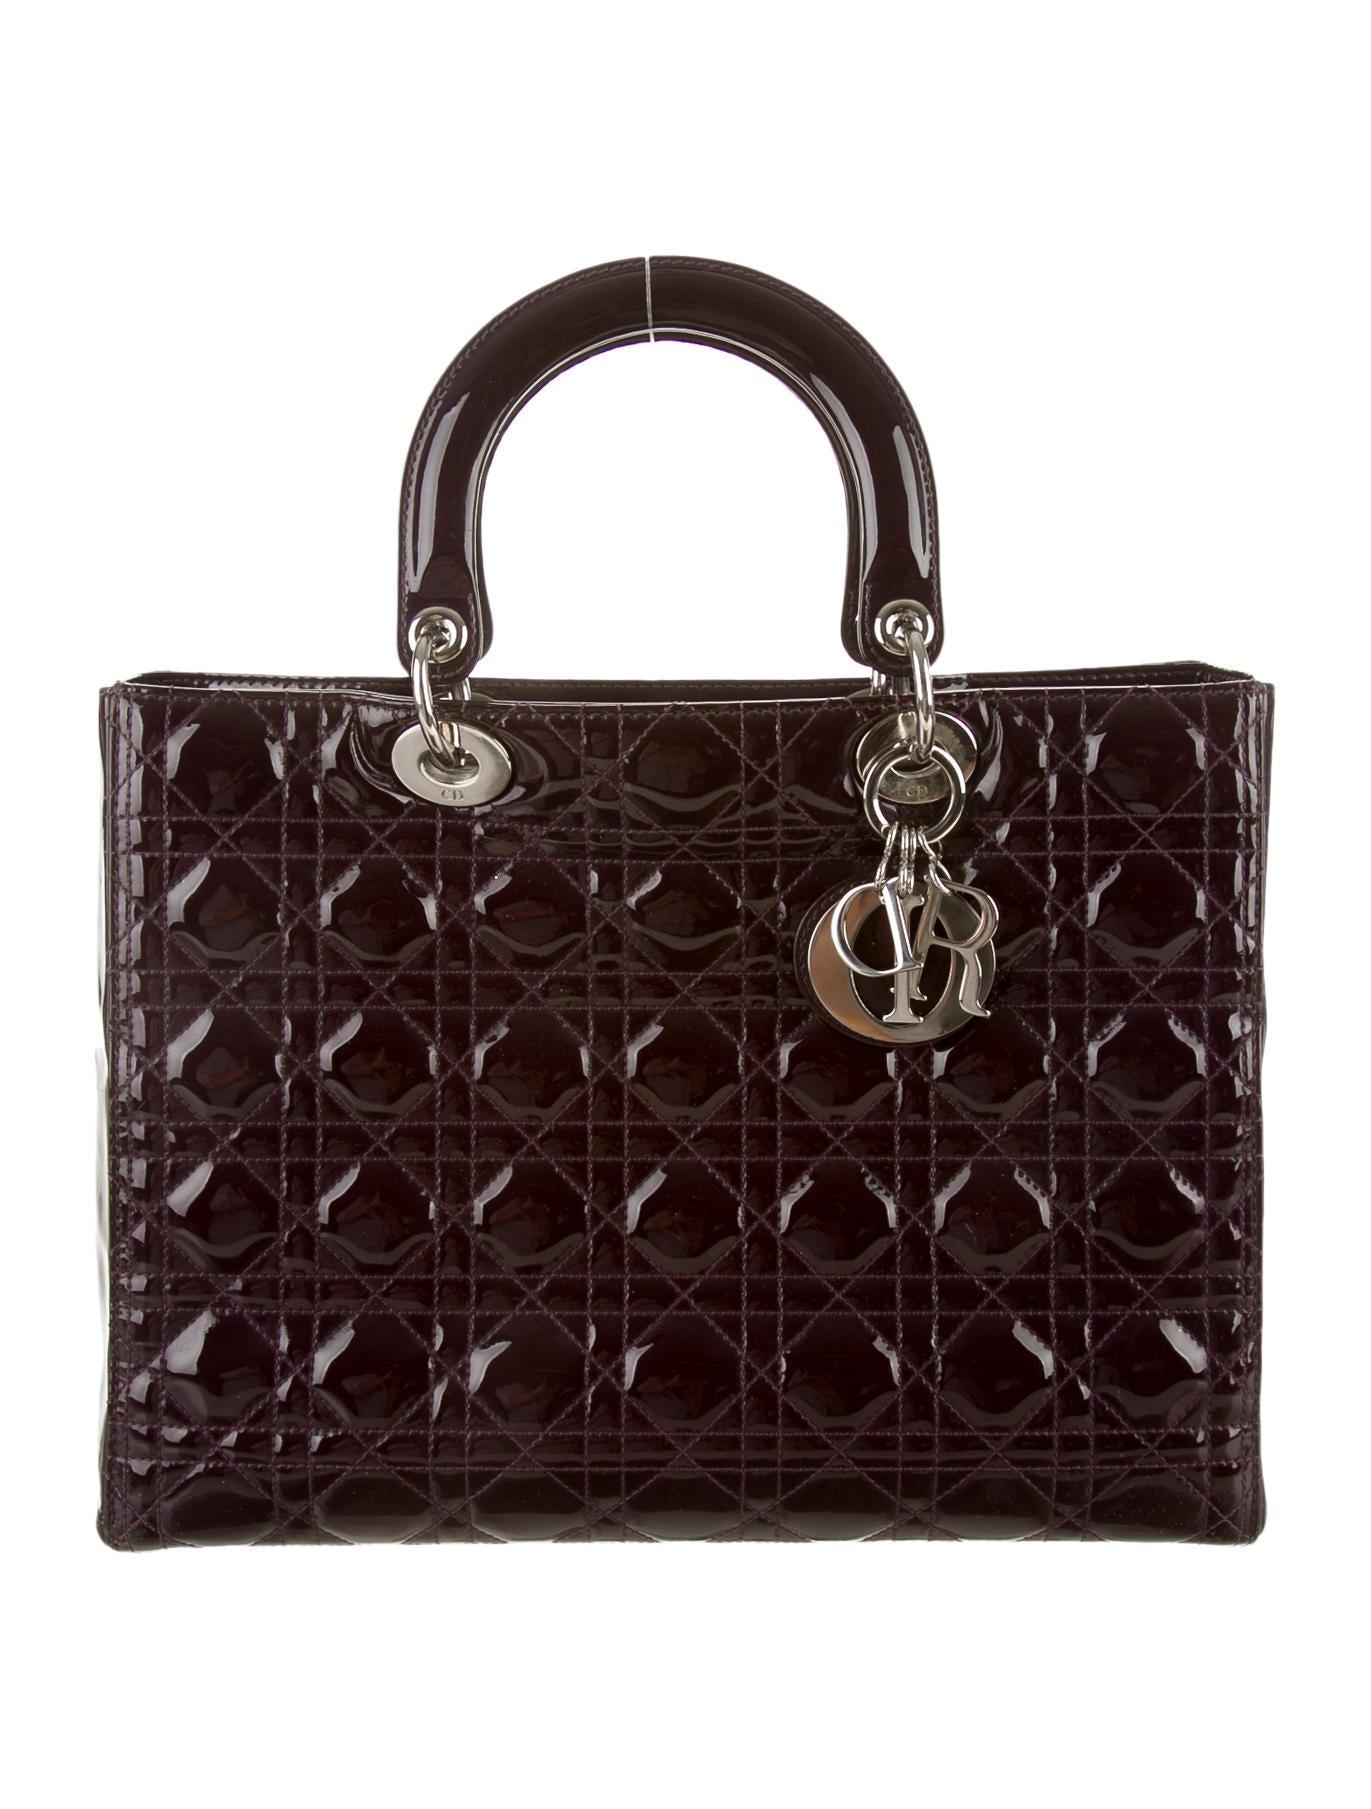 Model Women S Fashion Christian Dior Dior Handbags Handbags For Women